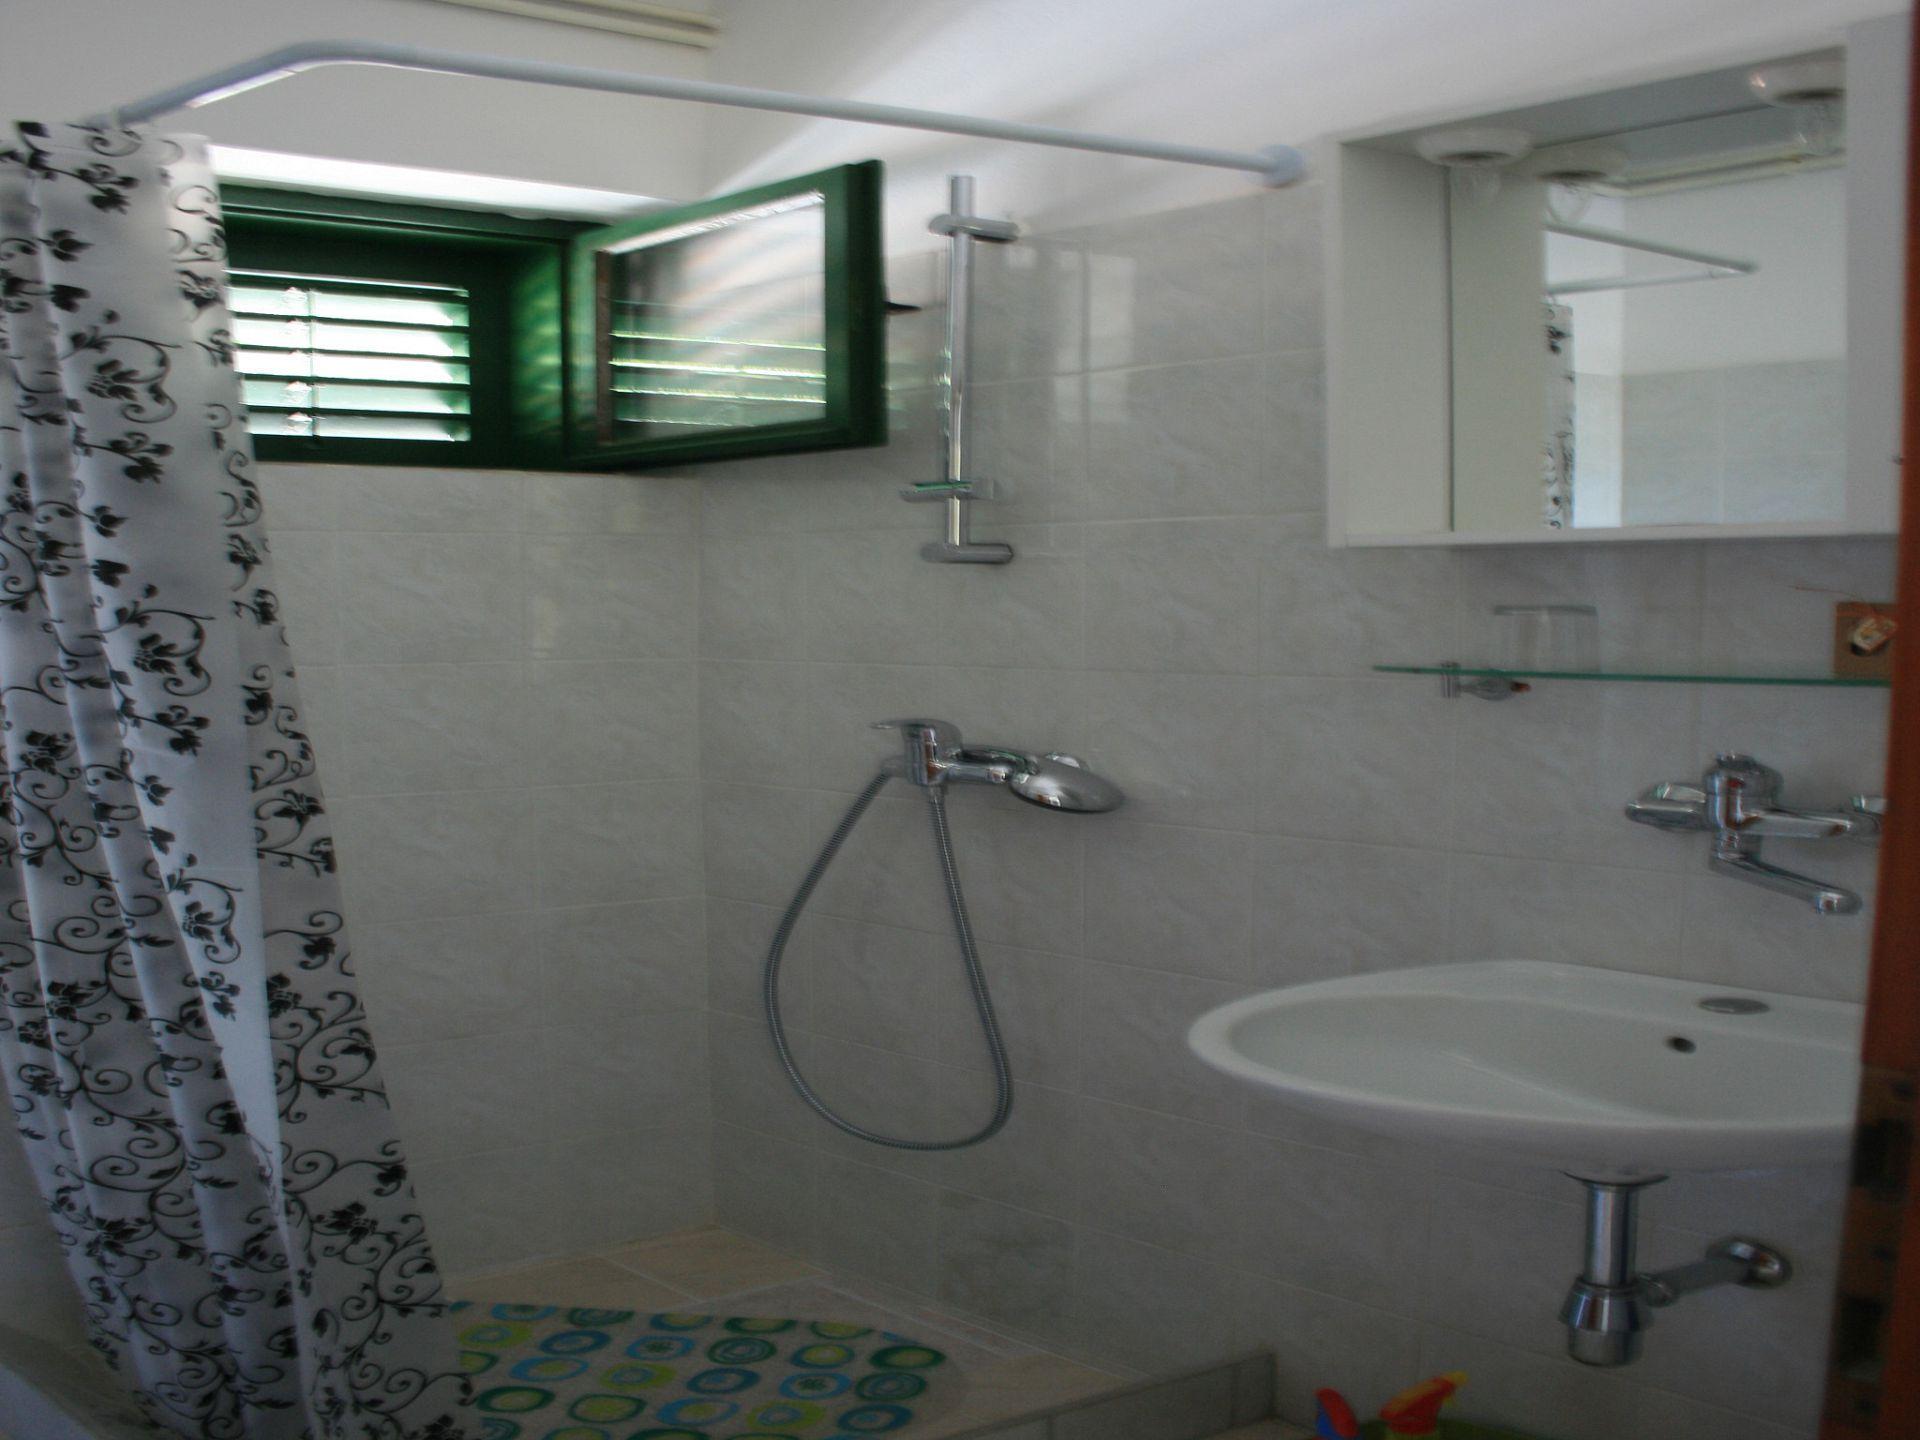 37656 - Jezera - Apartments Croatia - A-Laura(2+2): bathroom with toilet